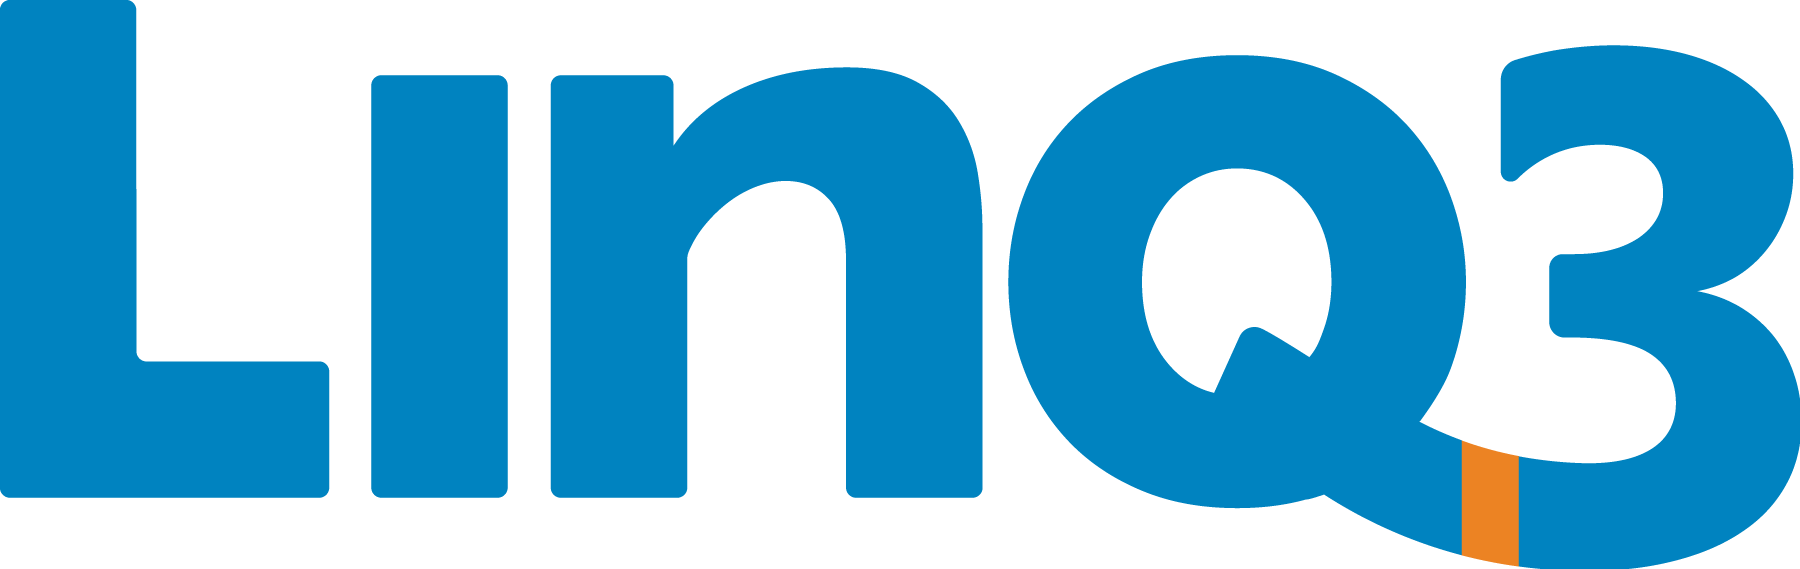 LINQ3 Logo CMYK HiRes 11-30-15